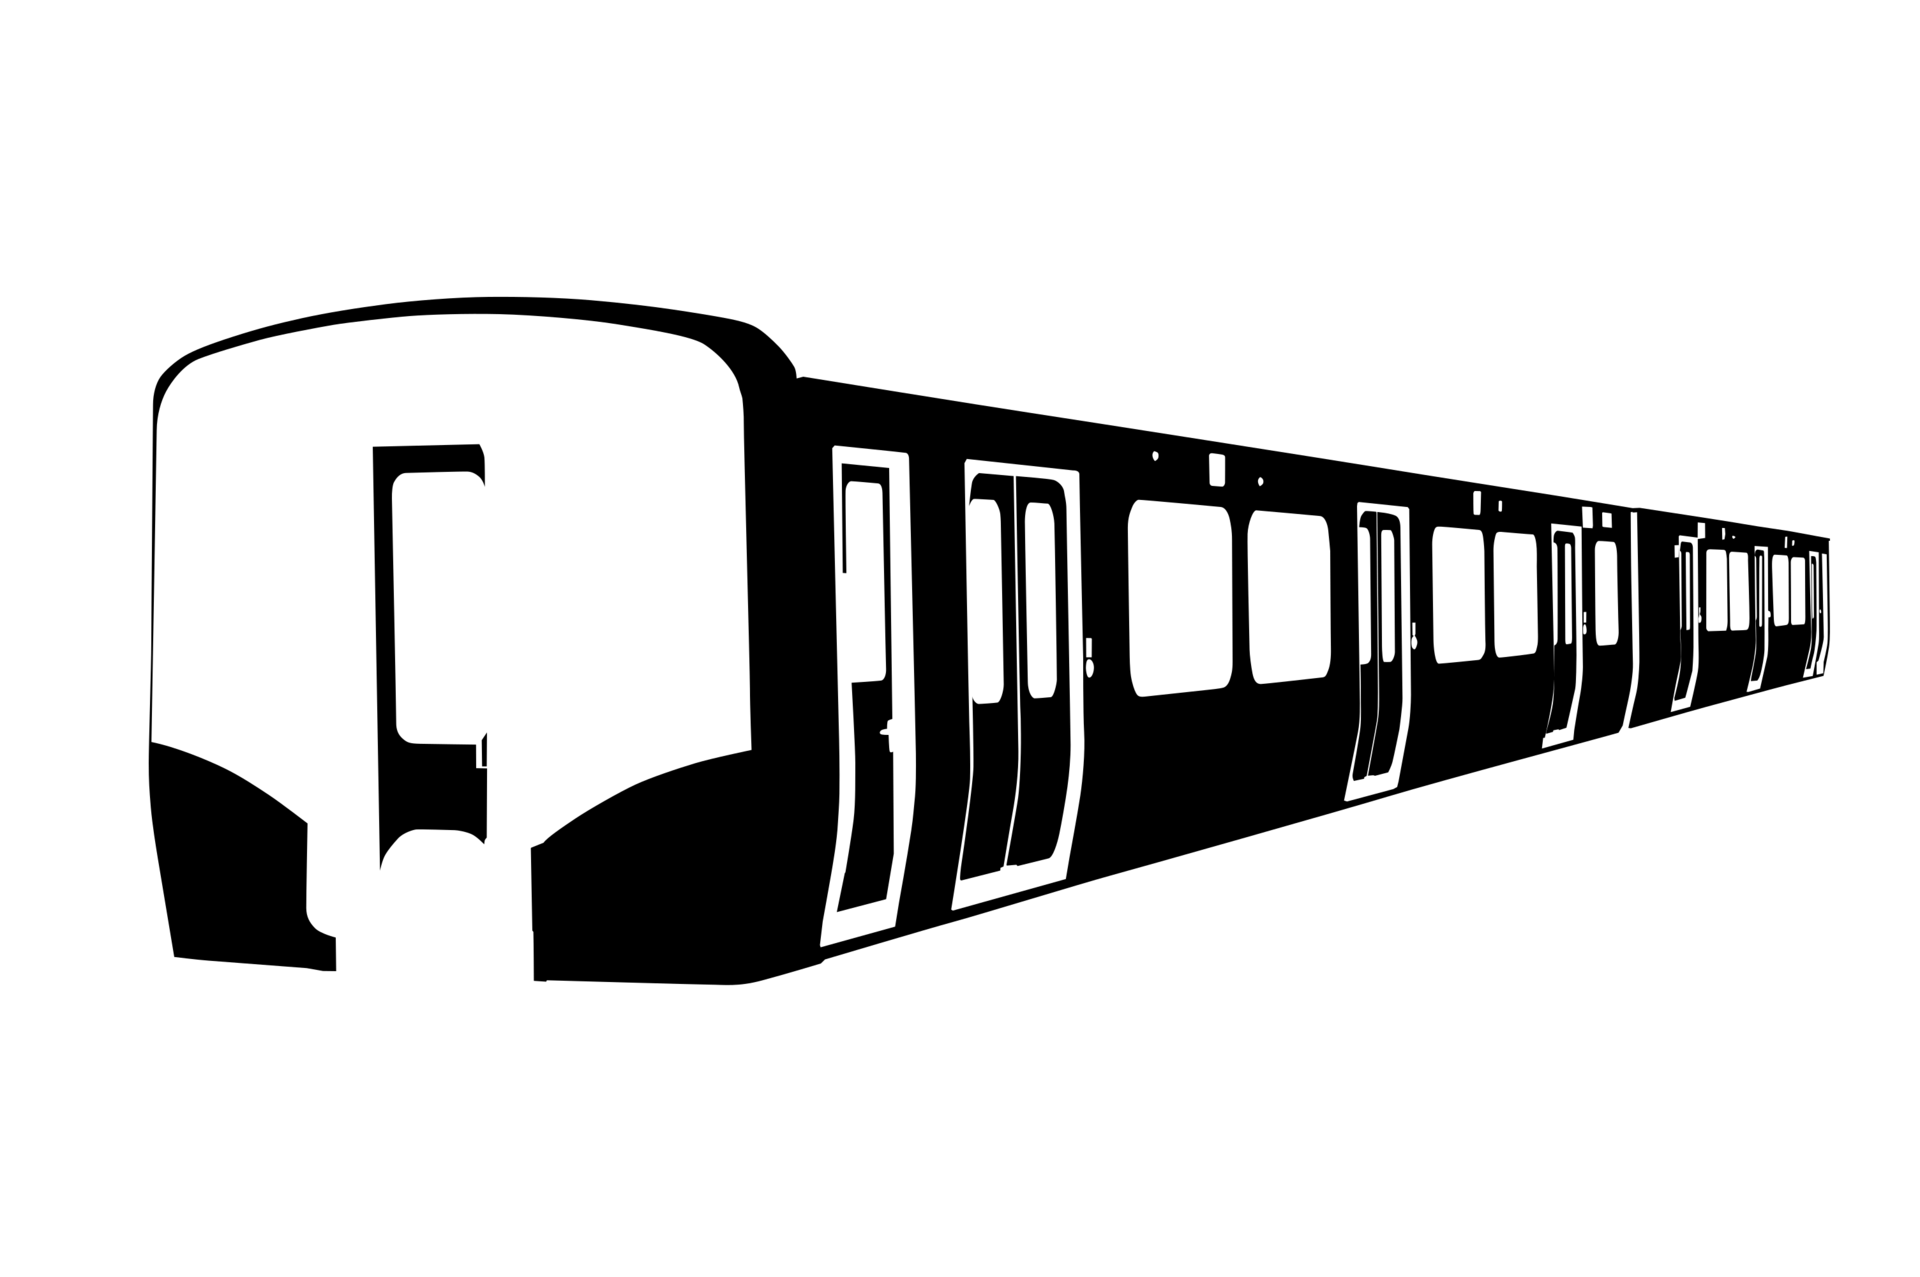 E129系の型紙